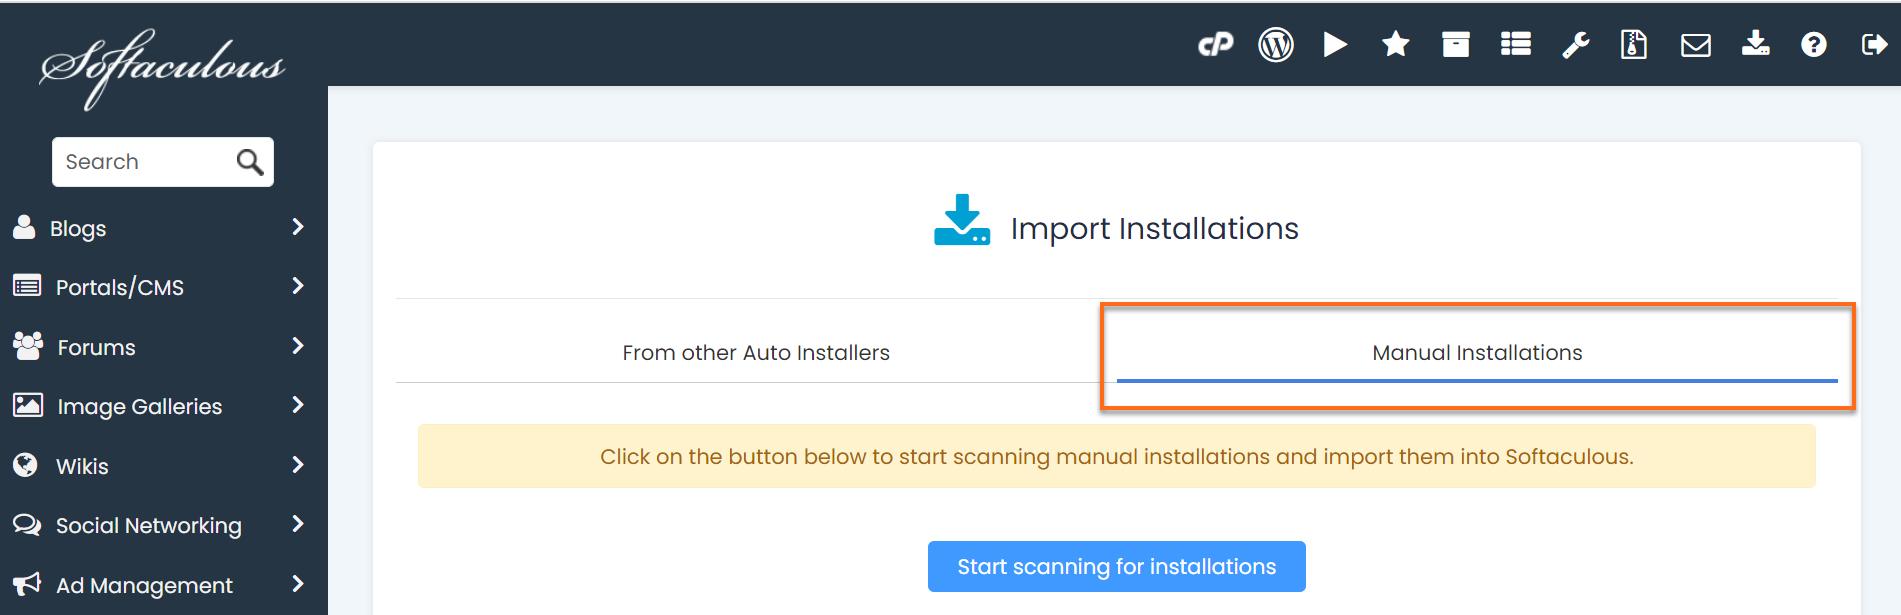 Softaculous Manual Installations tab